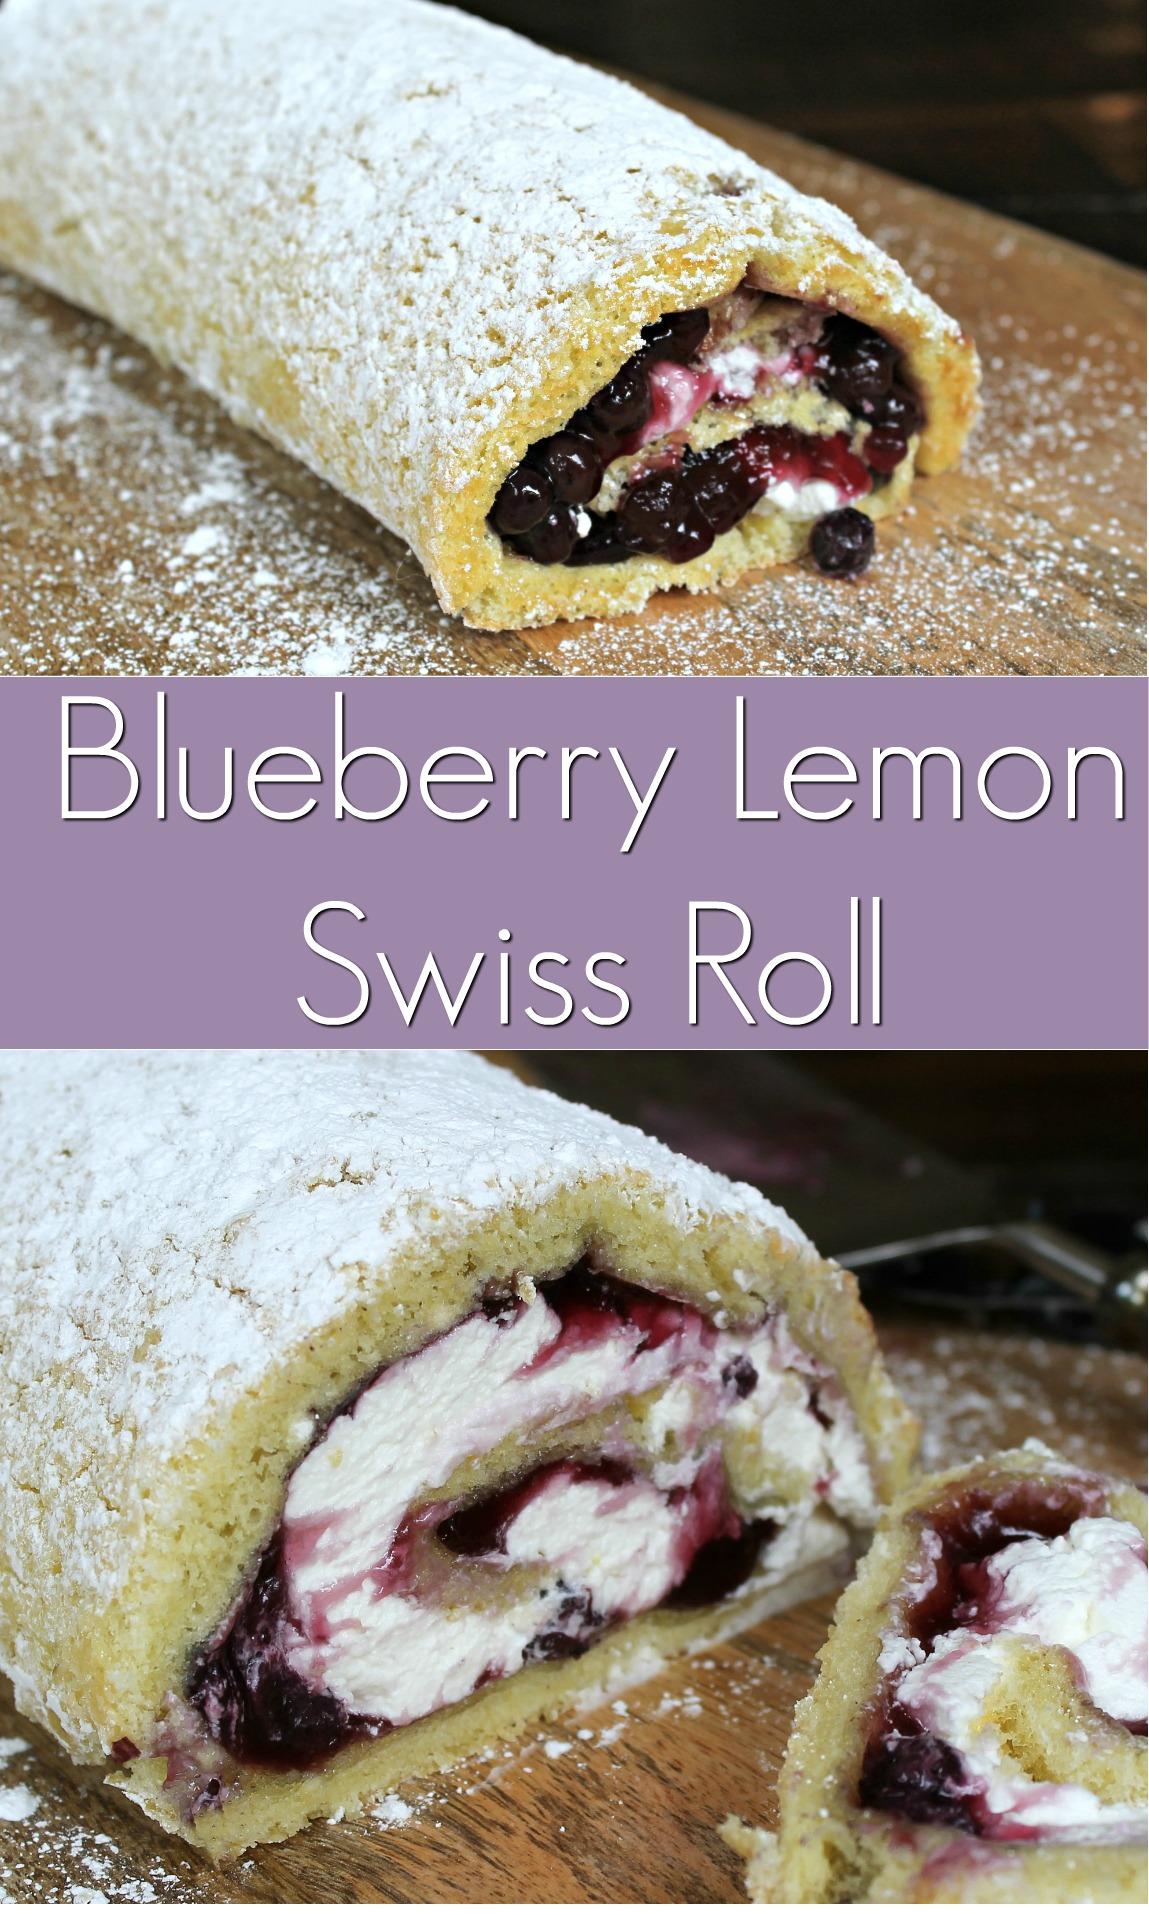 Blueberry Lemon Swiss Roll